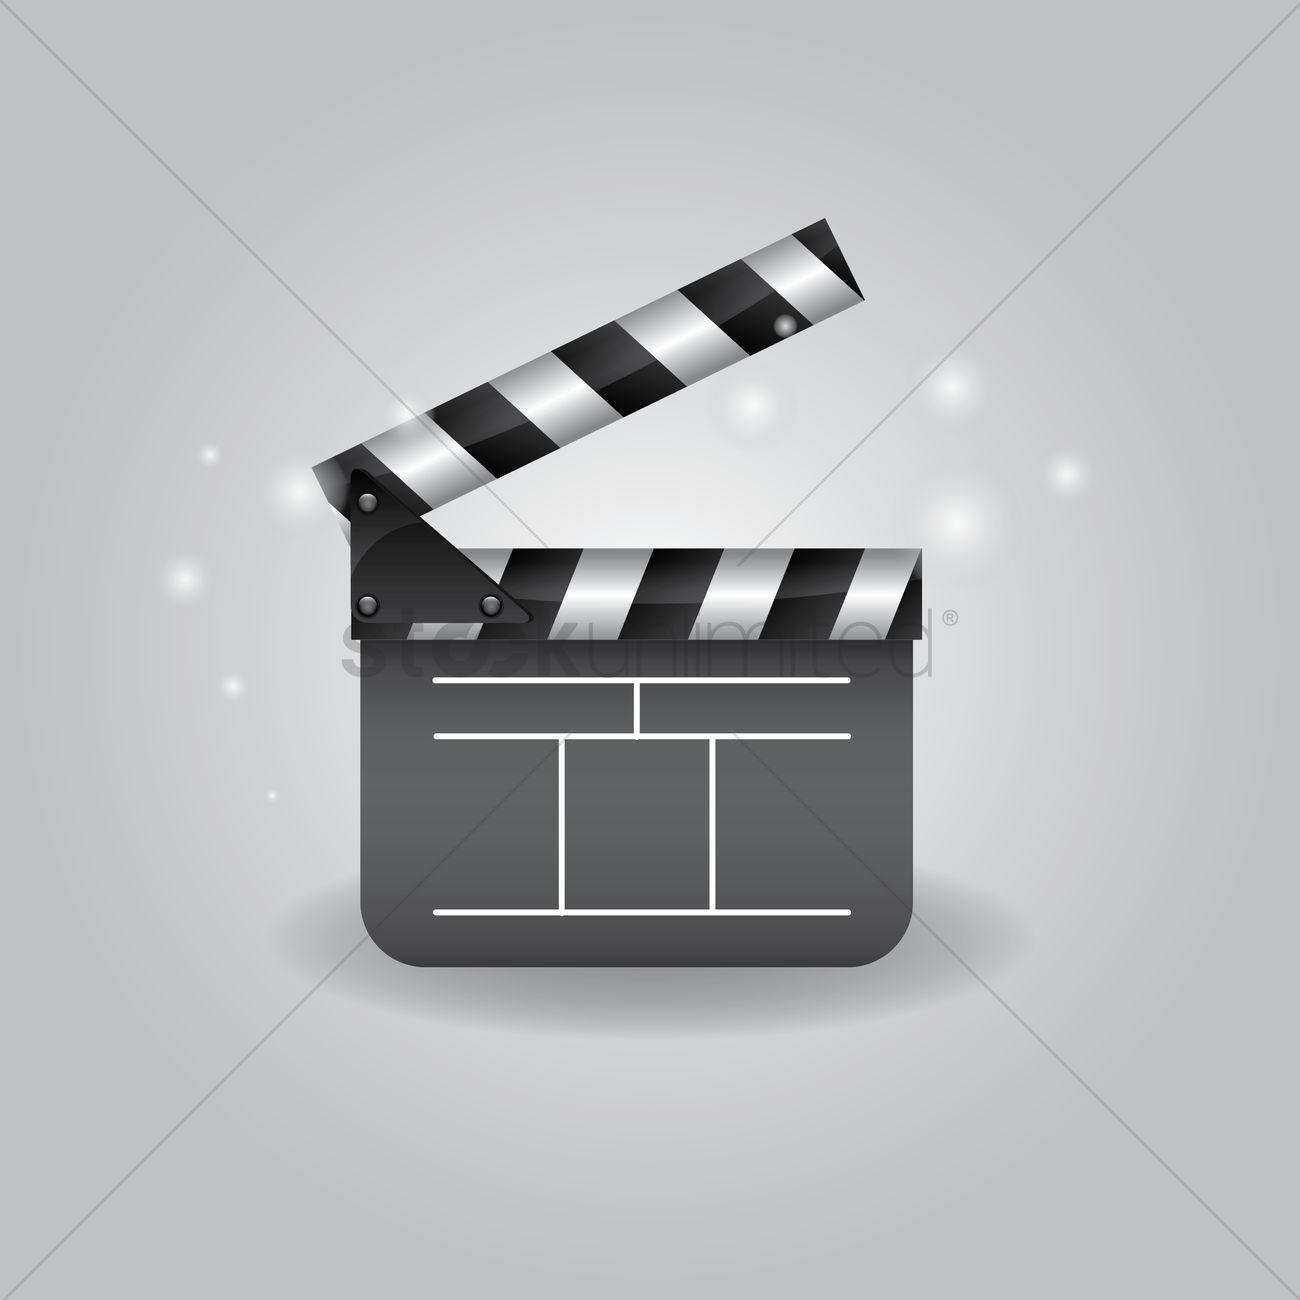 1300x1300 Movie Clapper Vector Image